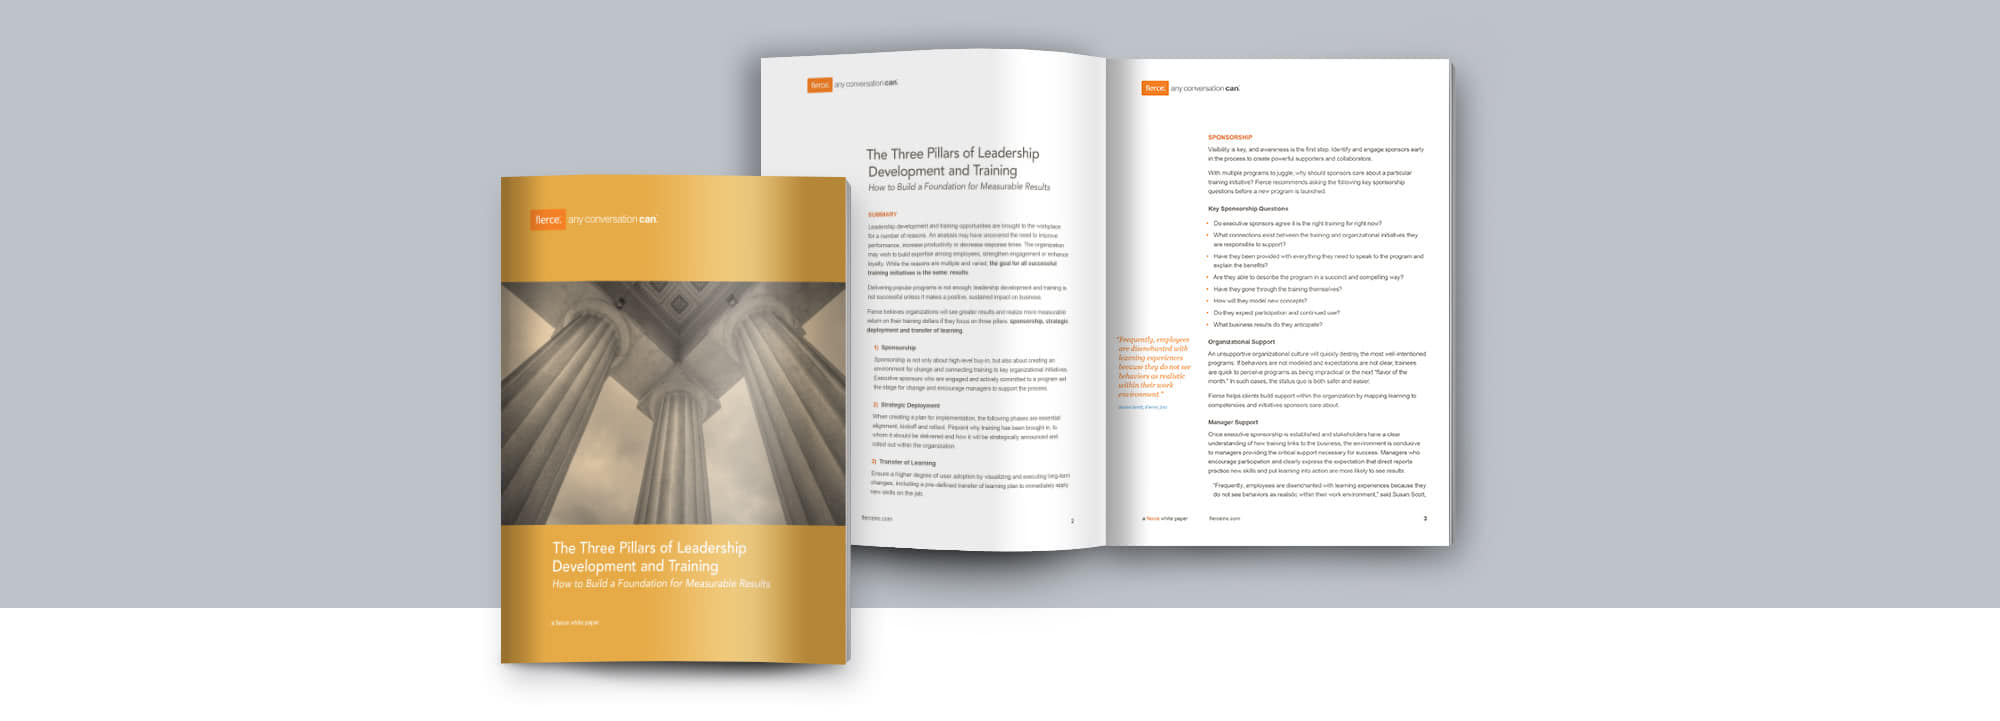 Fierce Conversations Whitepaper 3 Pillars of Leadership Development and Training